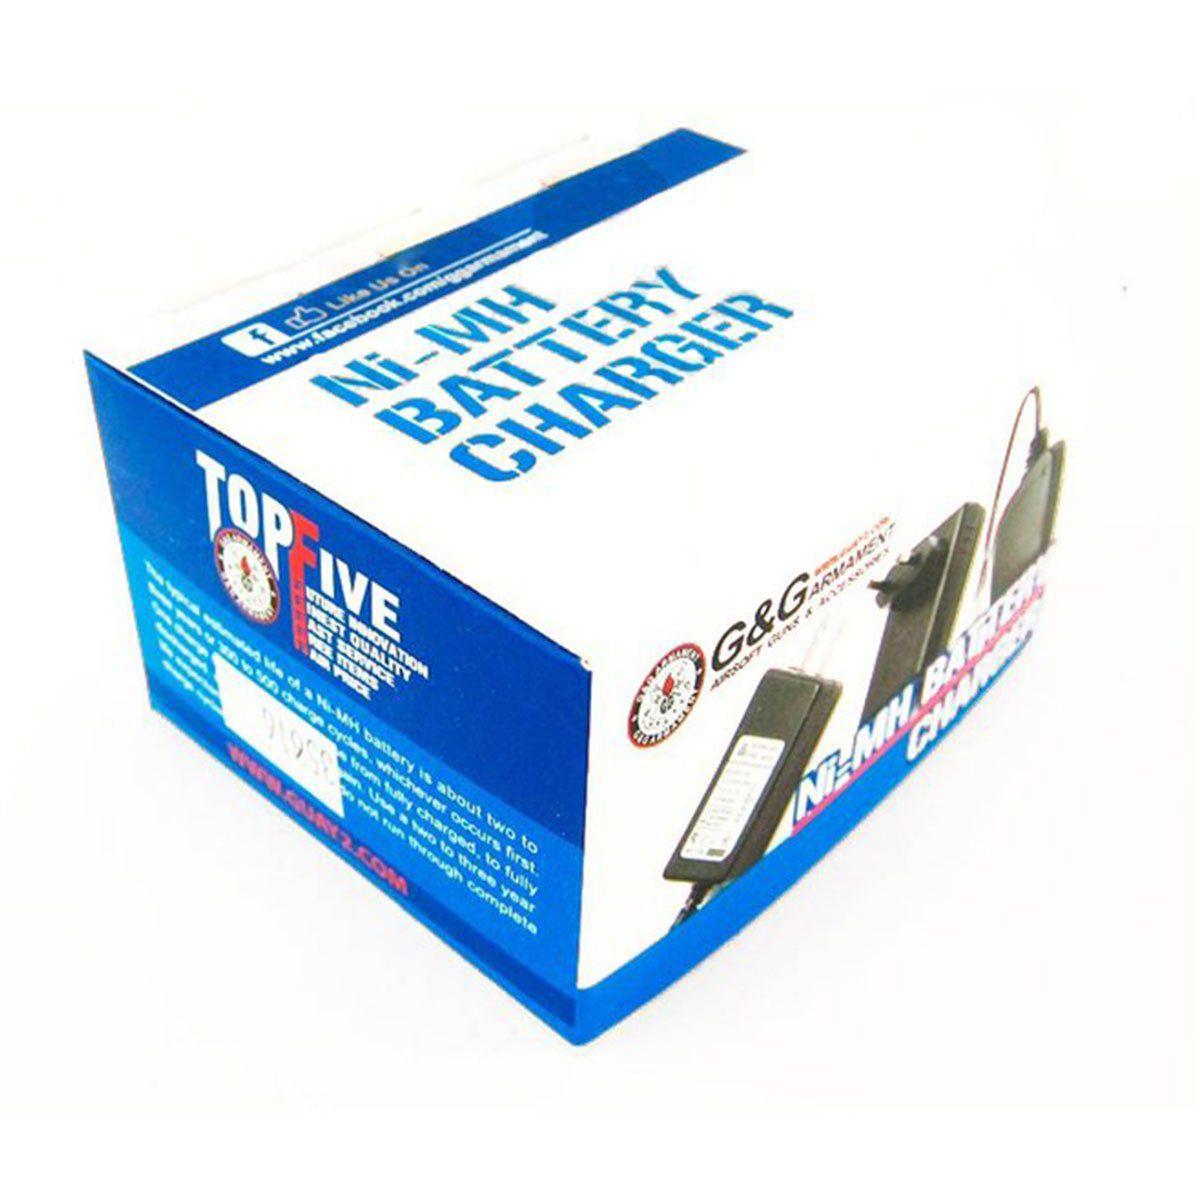 Recarregador de Baterias NiMh Bivolt GG C/ LED